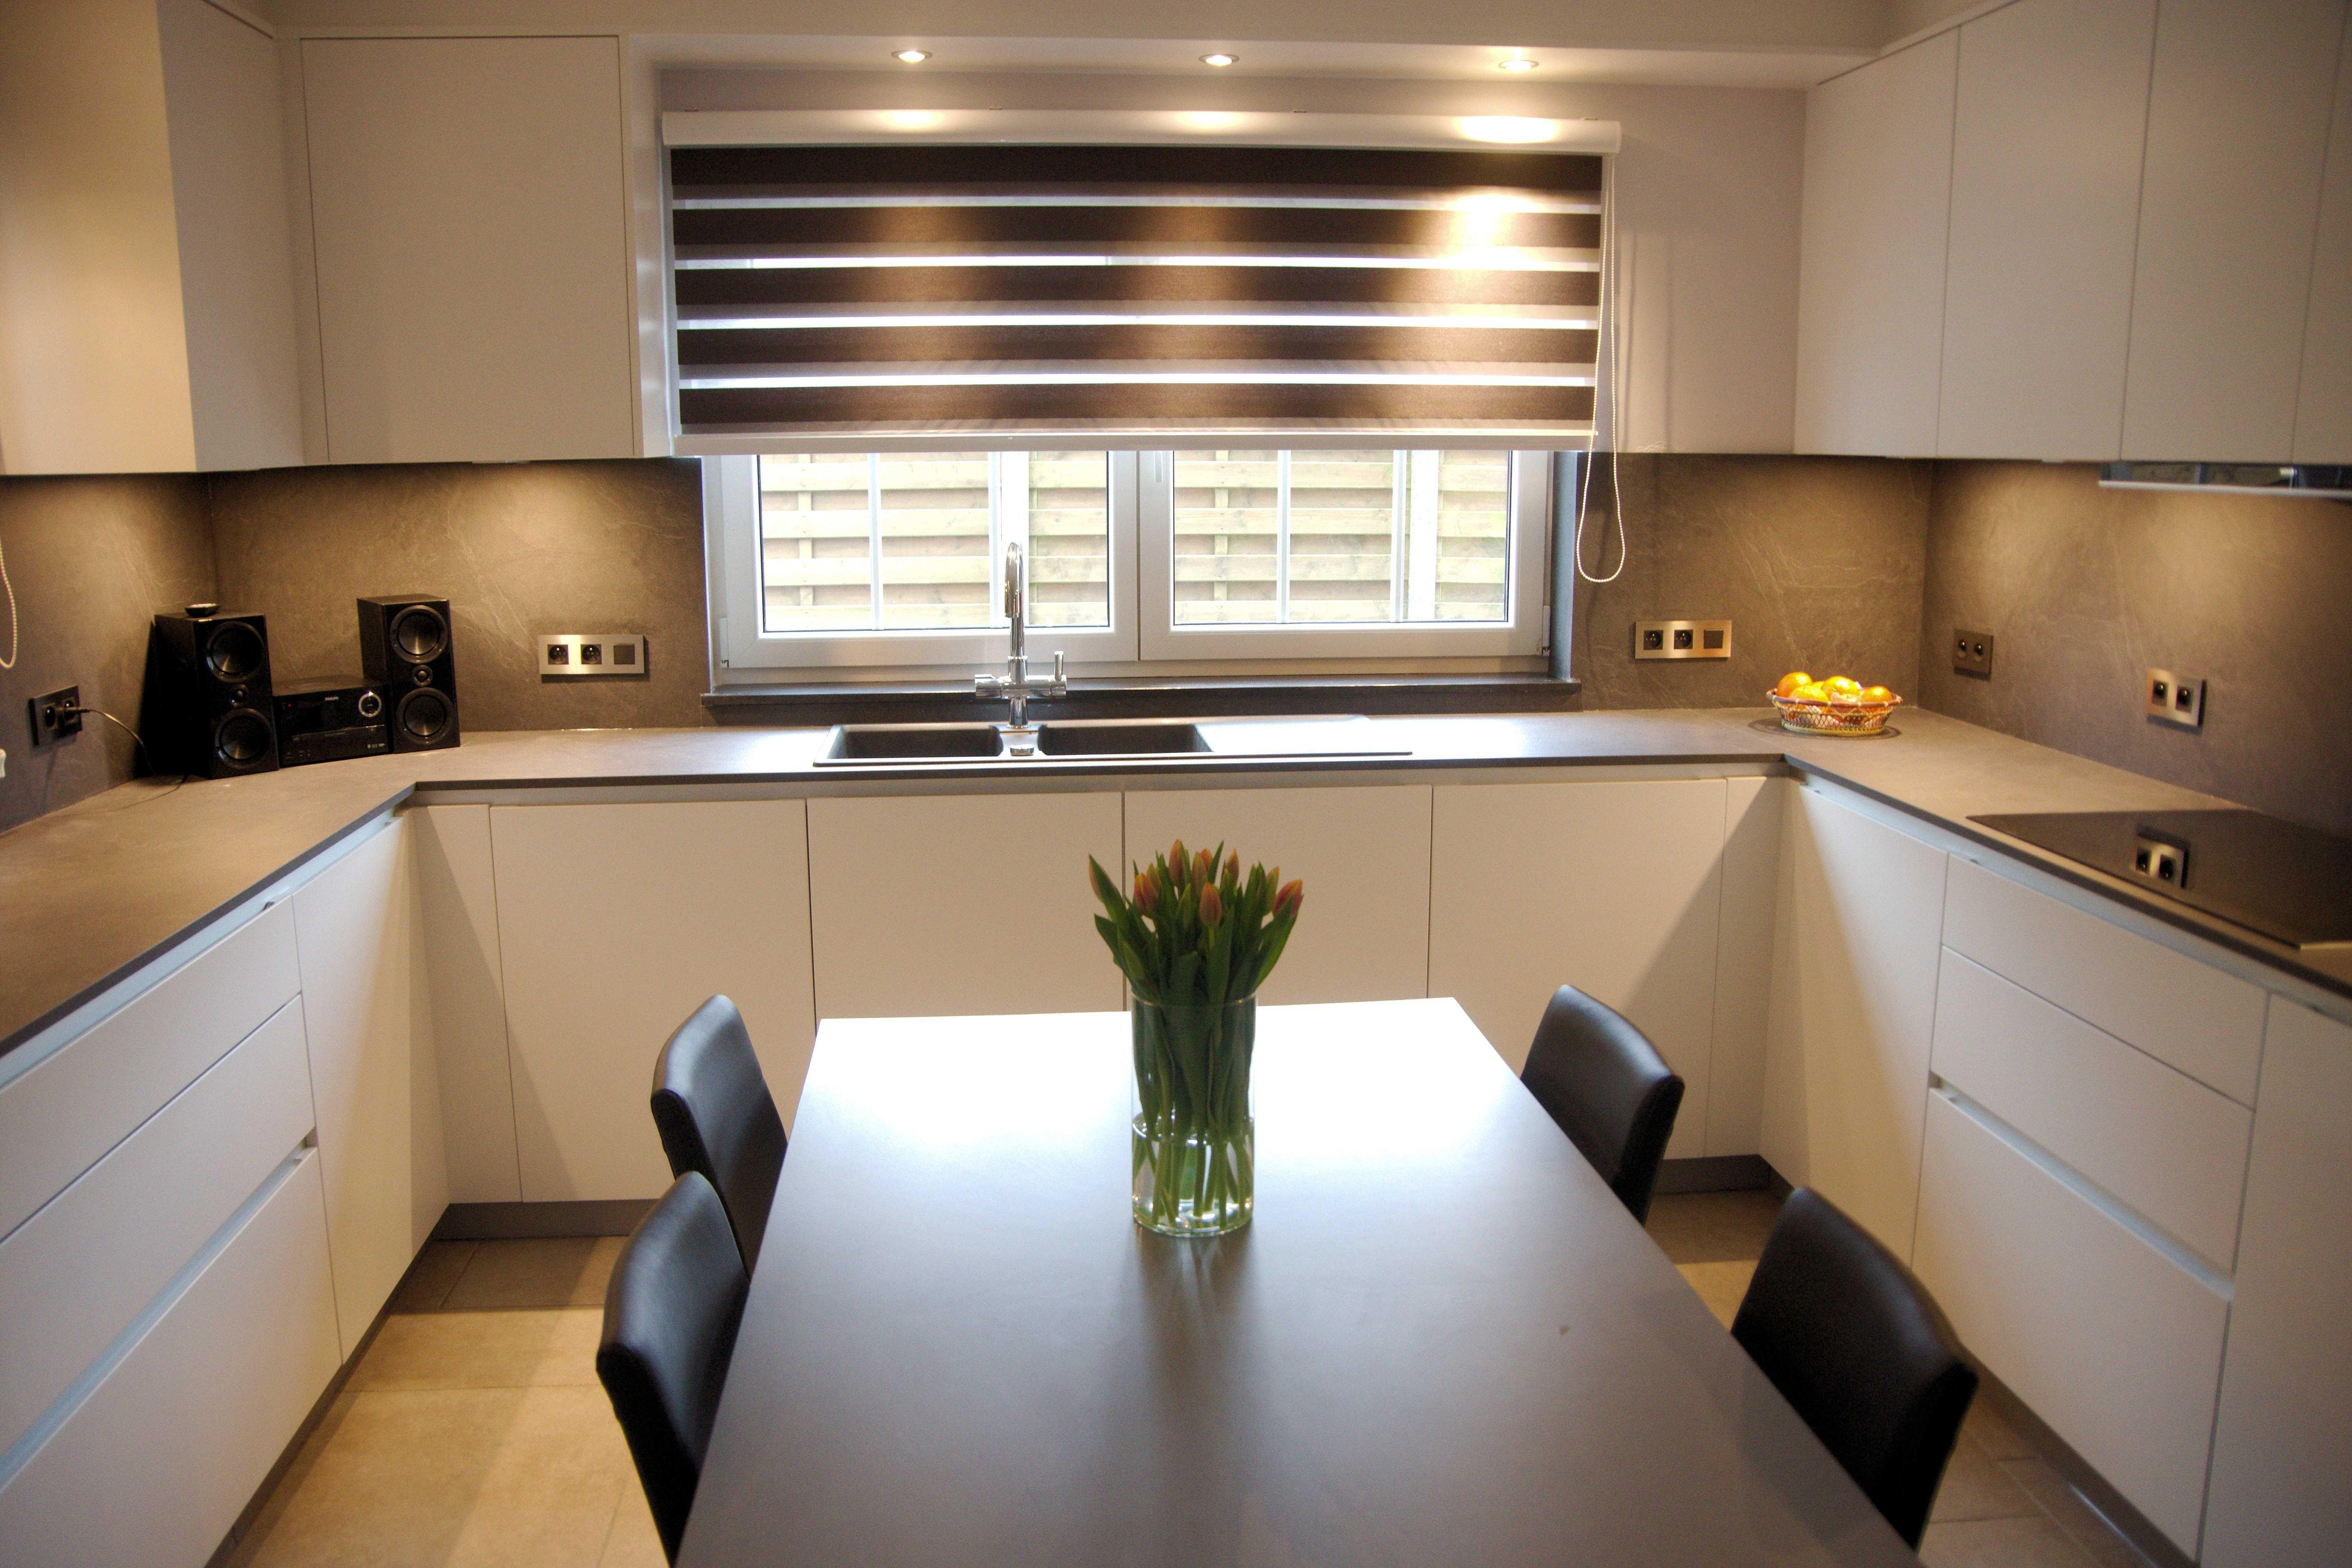 Kvik tinta kitchen self installed køkken in kitchen